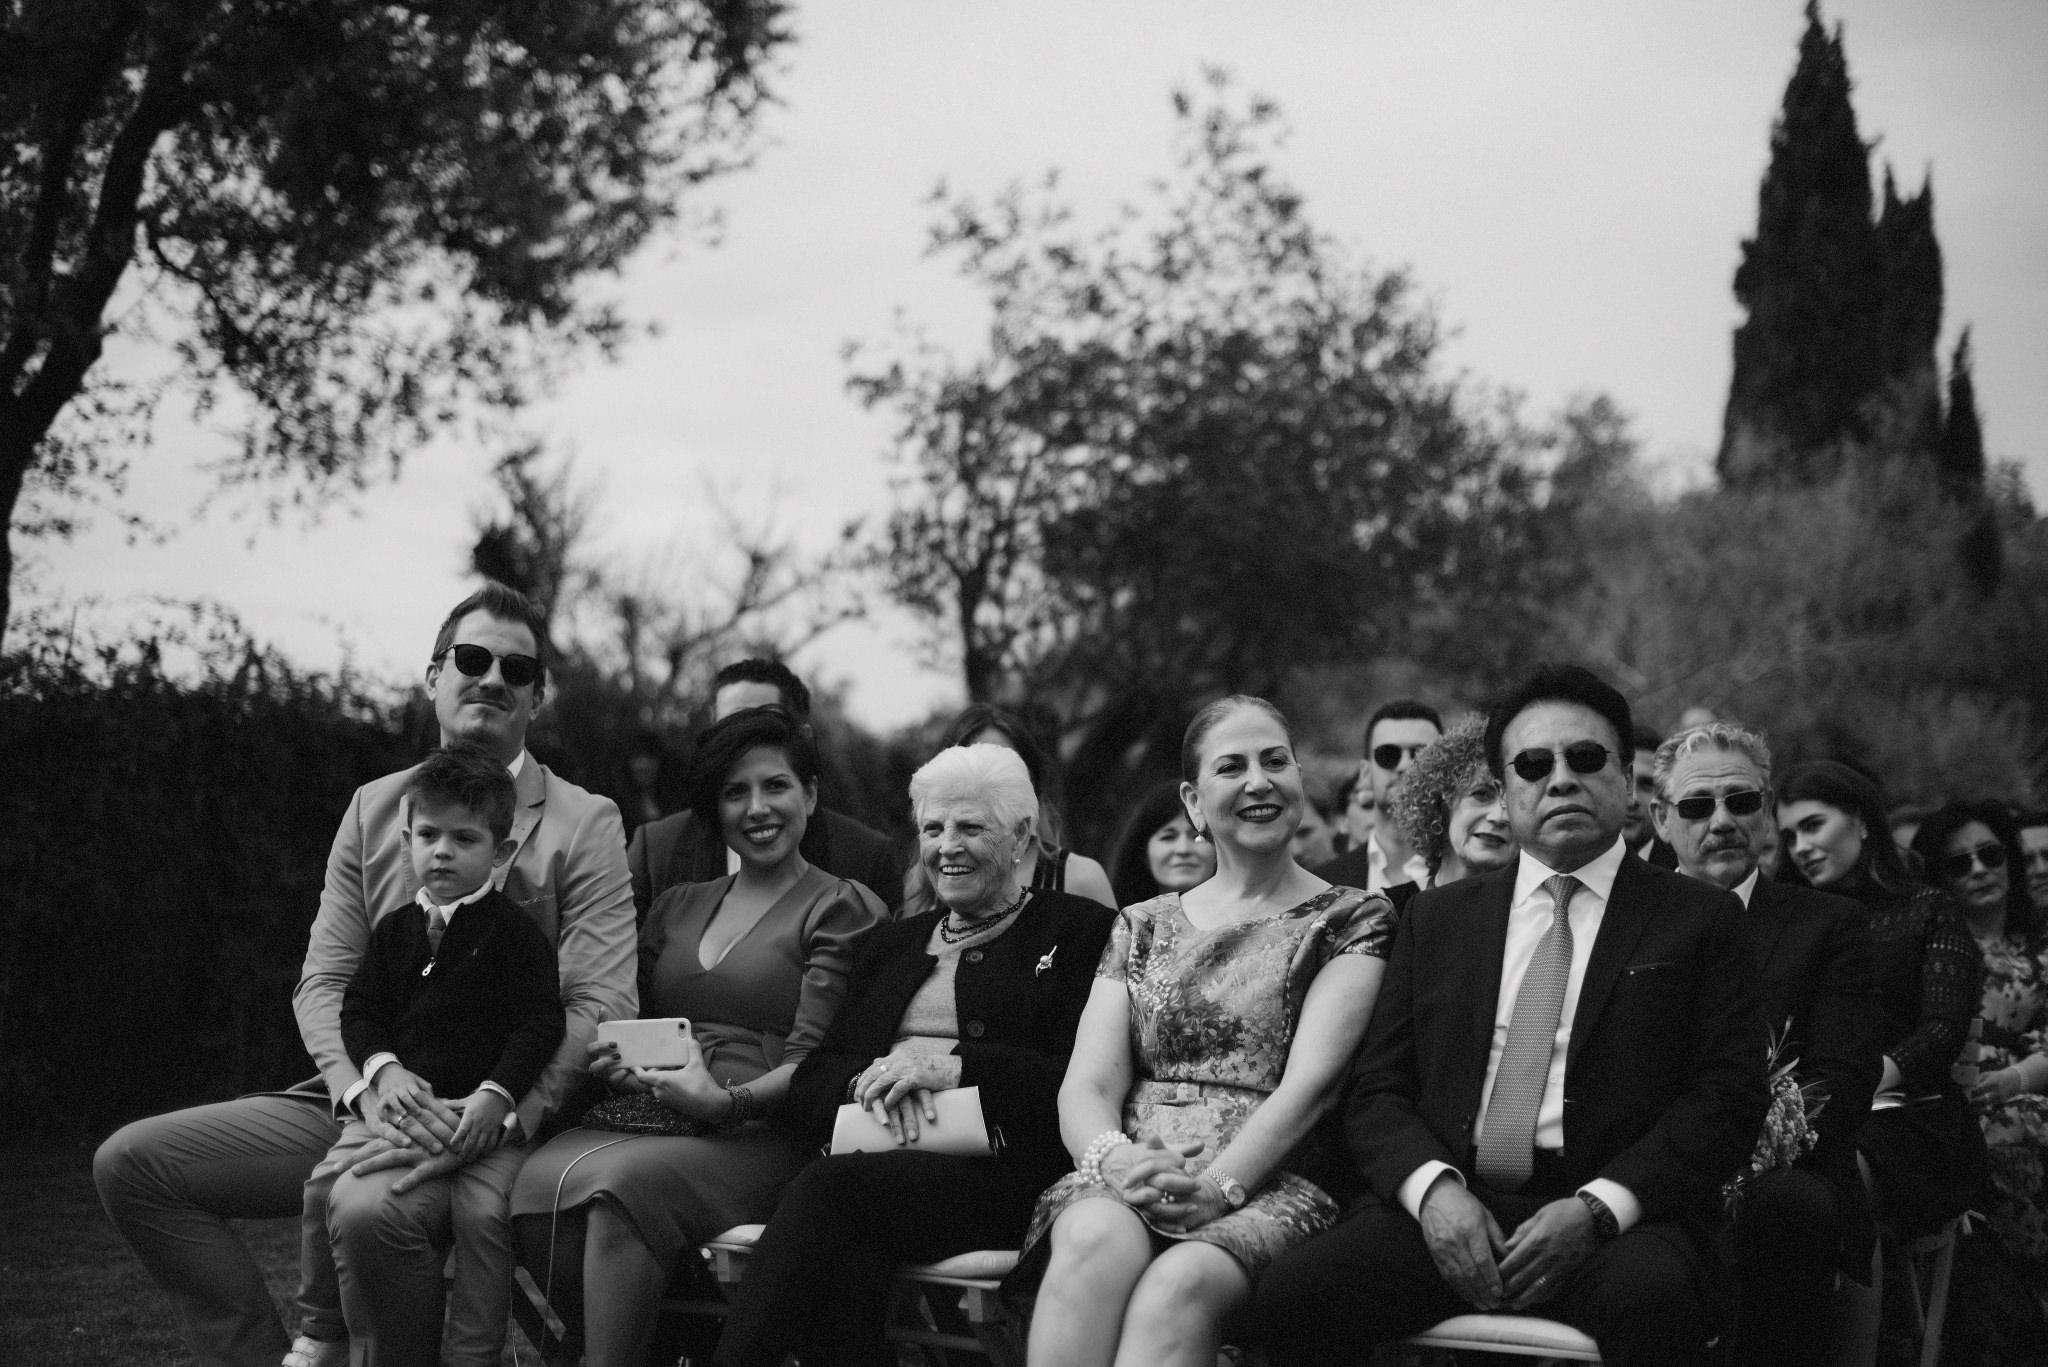 Bruidsfotograaf Spanje Castle d'Emporda destination wedding Naomi van der Kraan00037.jpg